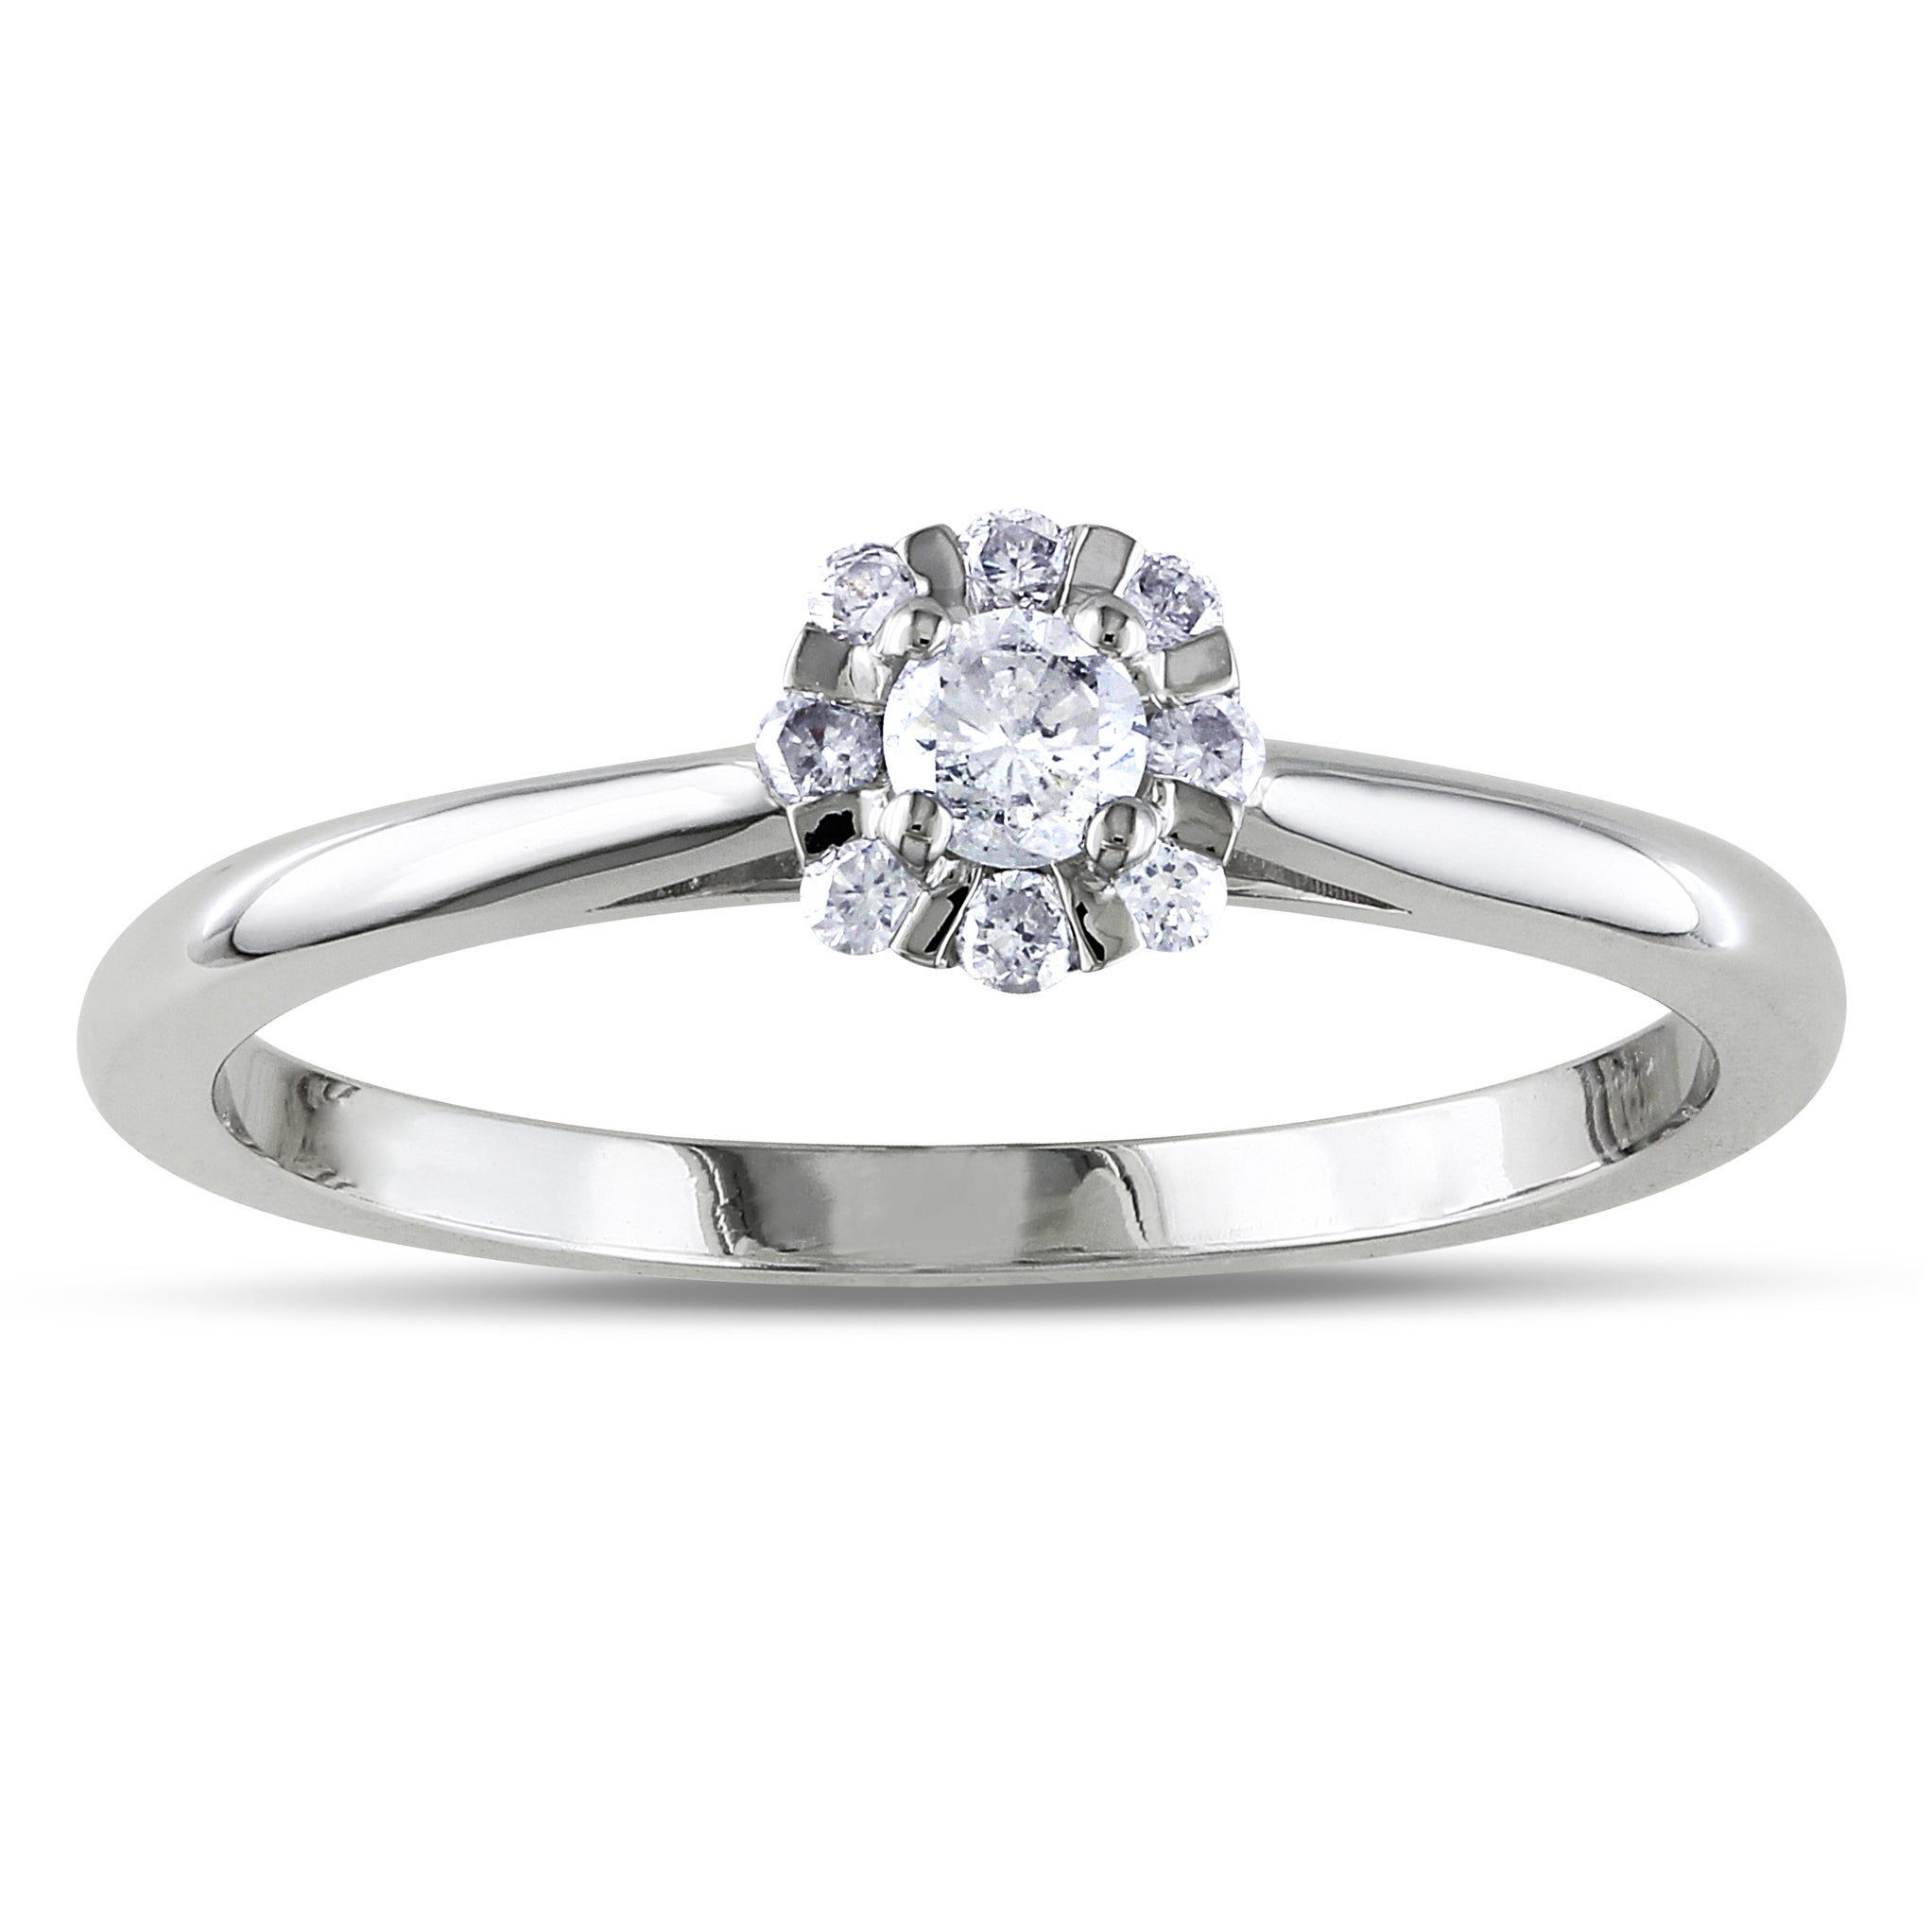 Miadora 10k White Gold 1/5ct TDW Diamond Engagement Ring (H-I, I2-I3)